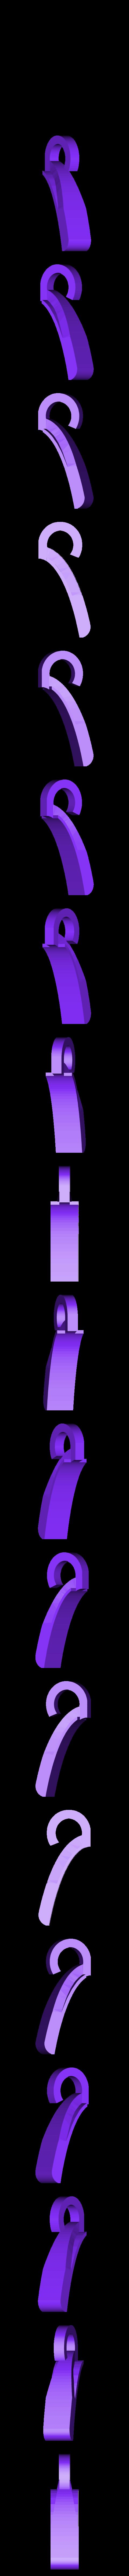 MVC_Hook_PRINTx4.stl Download free STL file Viking Chest - Hedeby and fantasy version • 3D printable design, Snorri